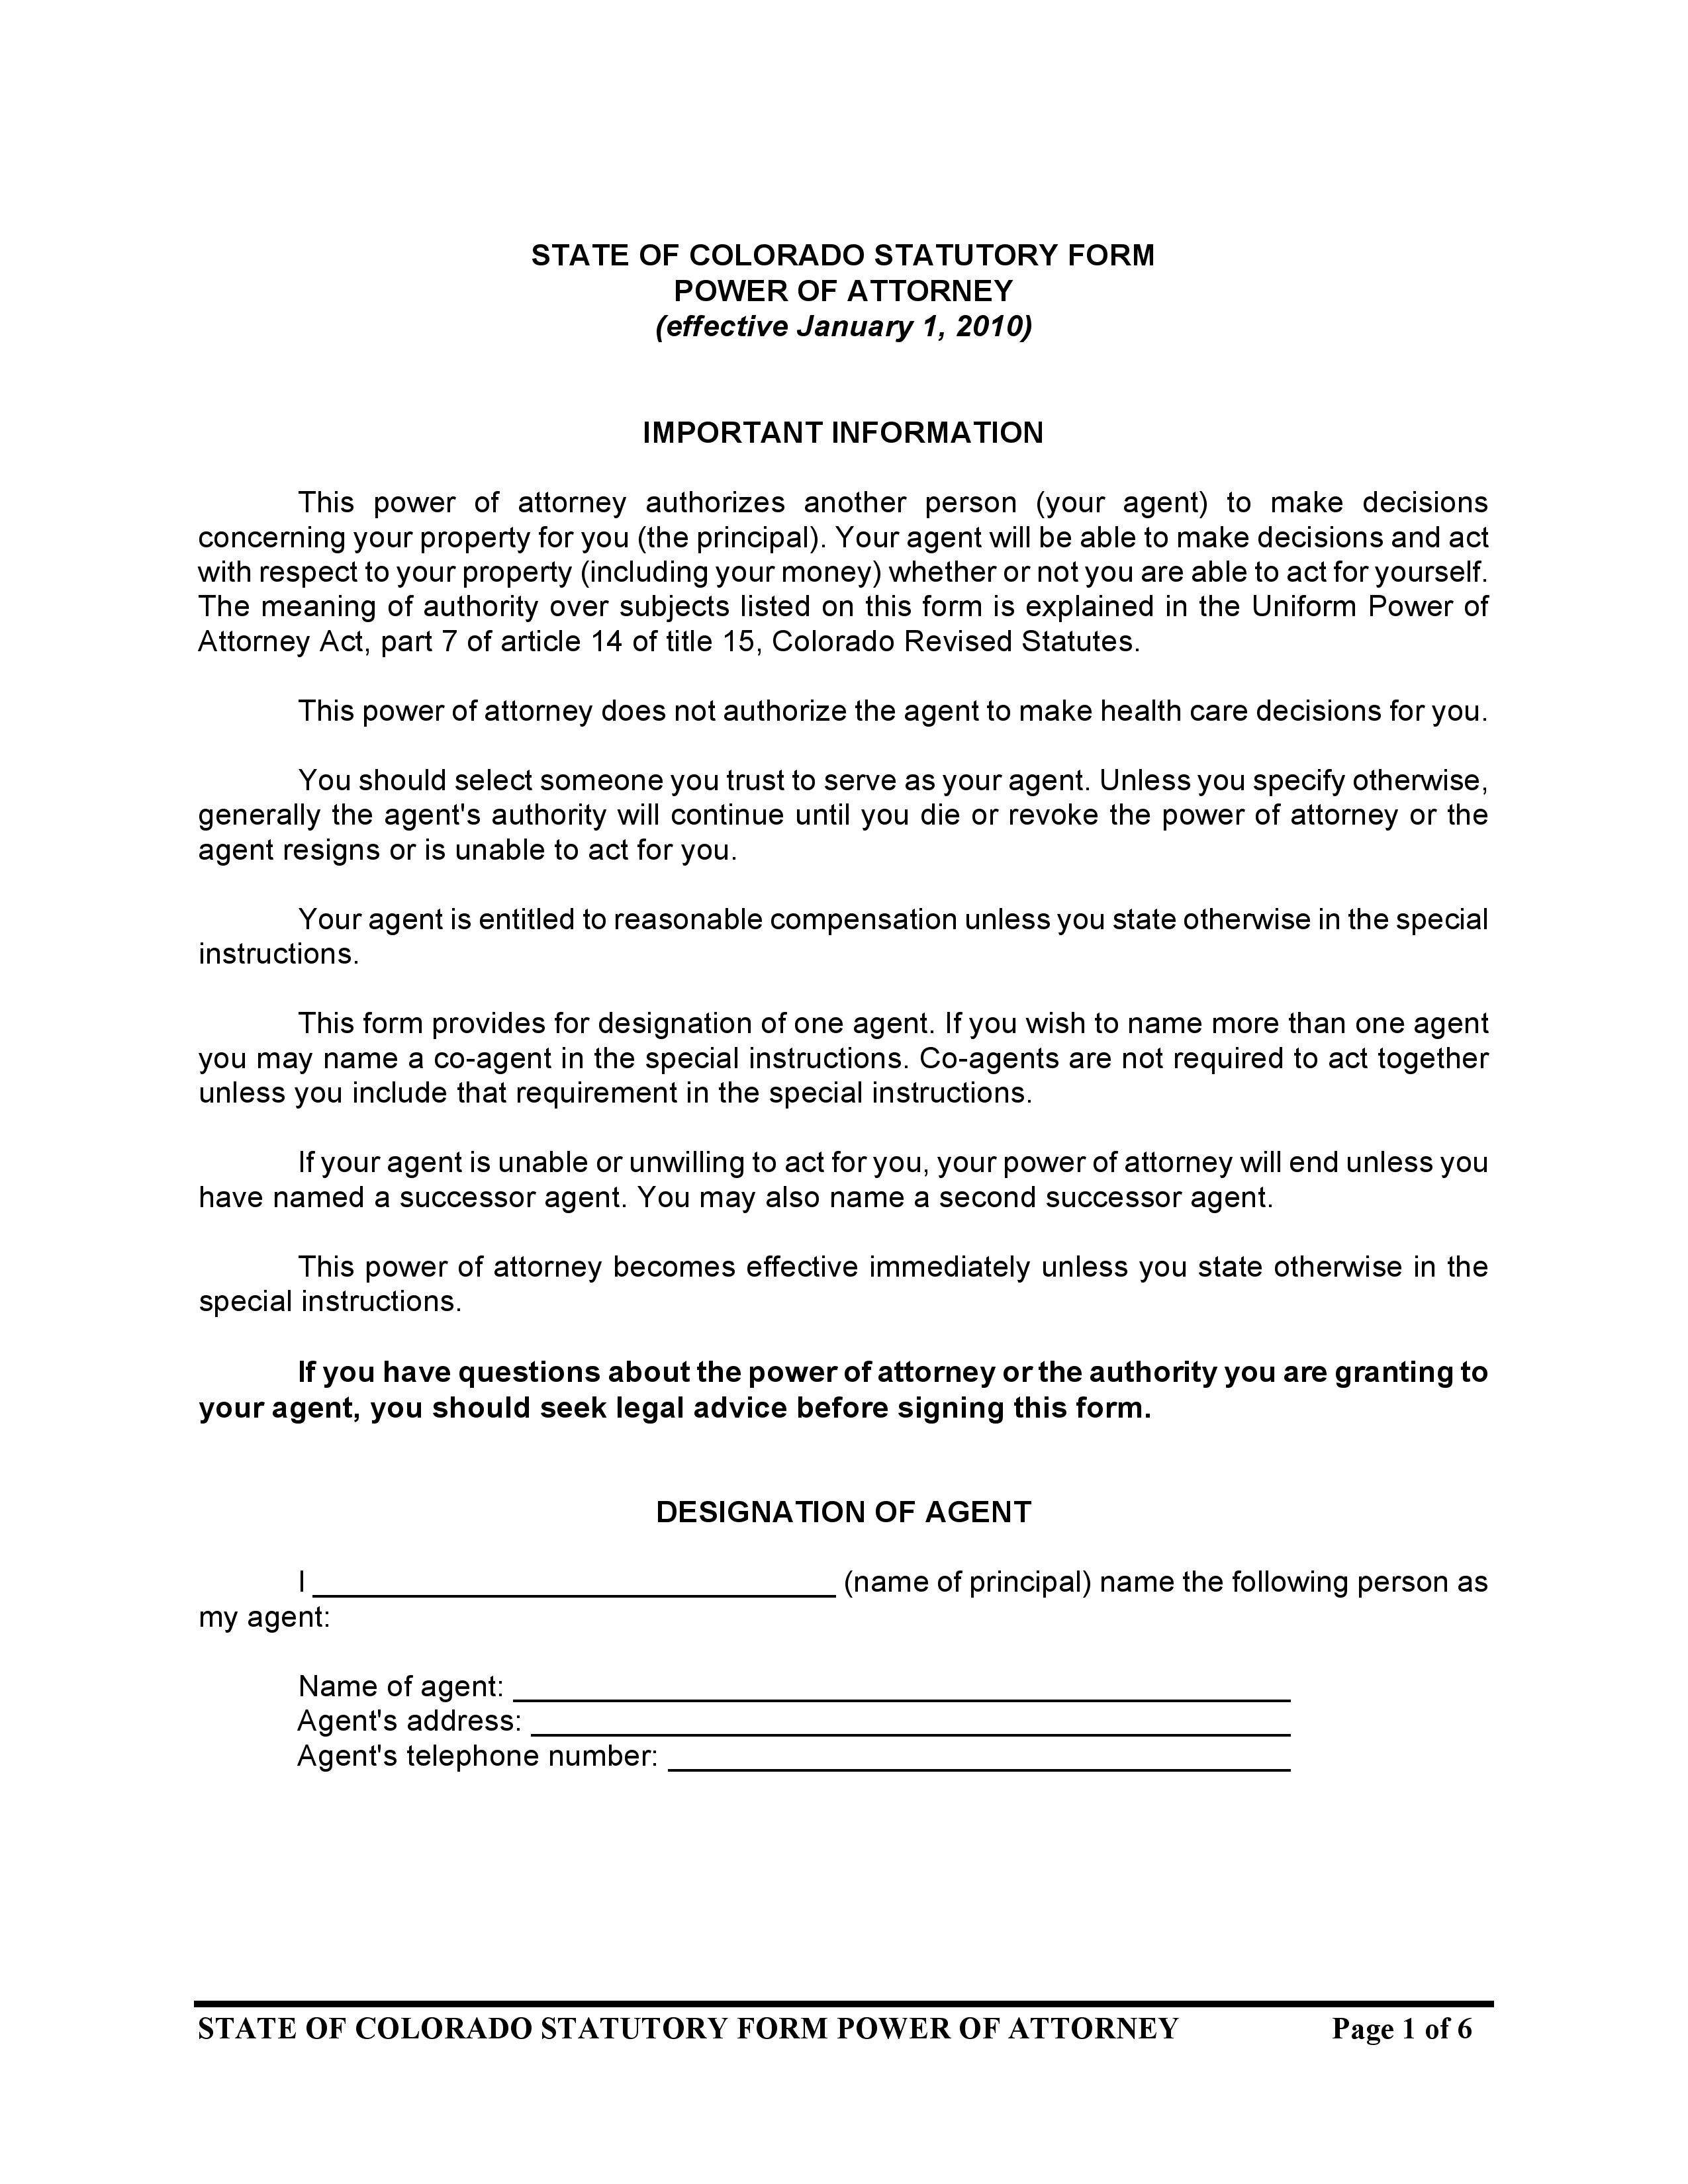 Colorado Statutory Form Power Of Attorney